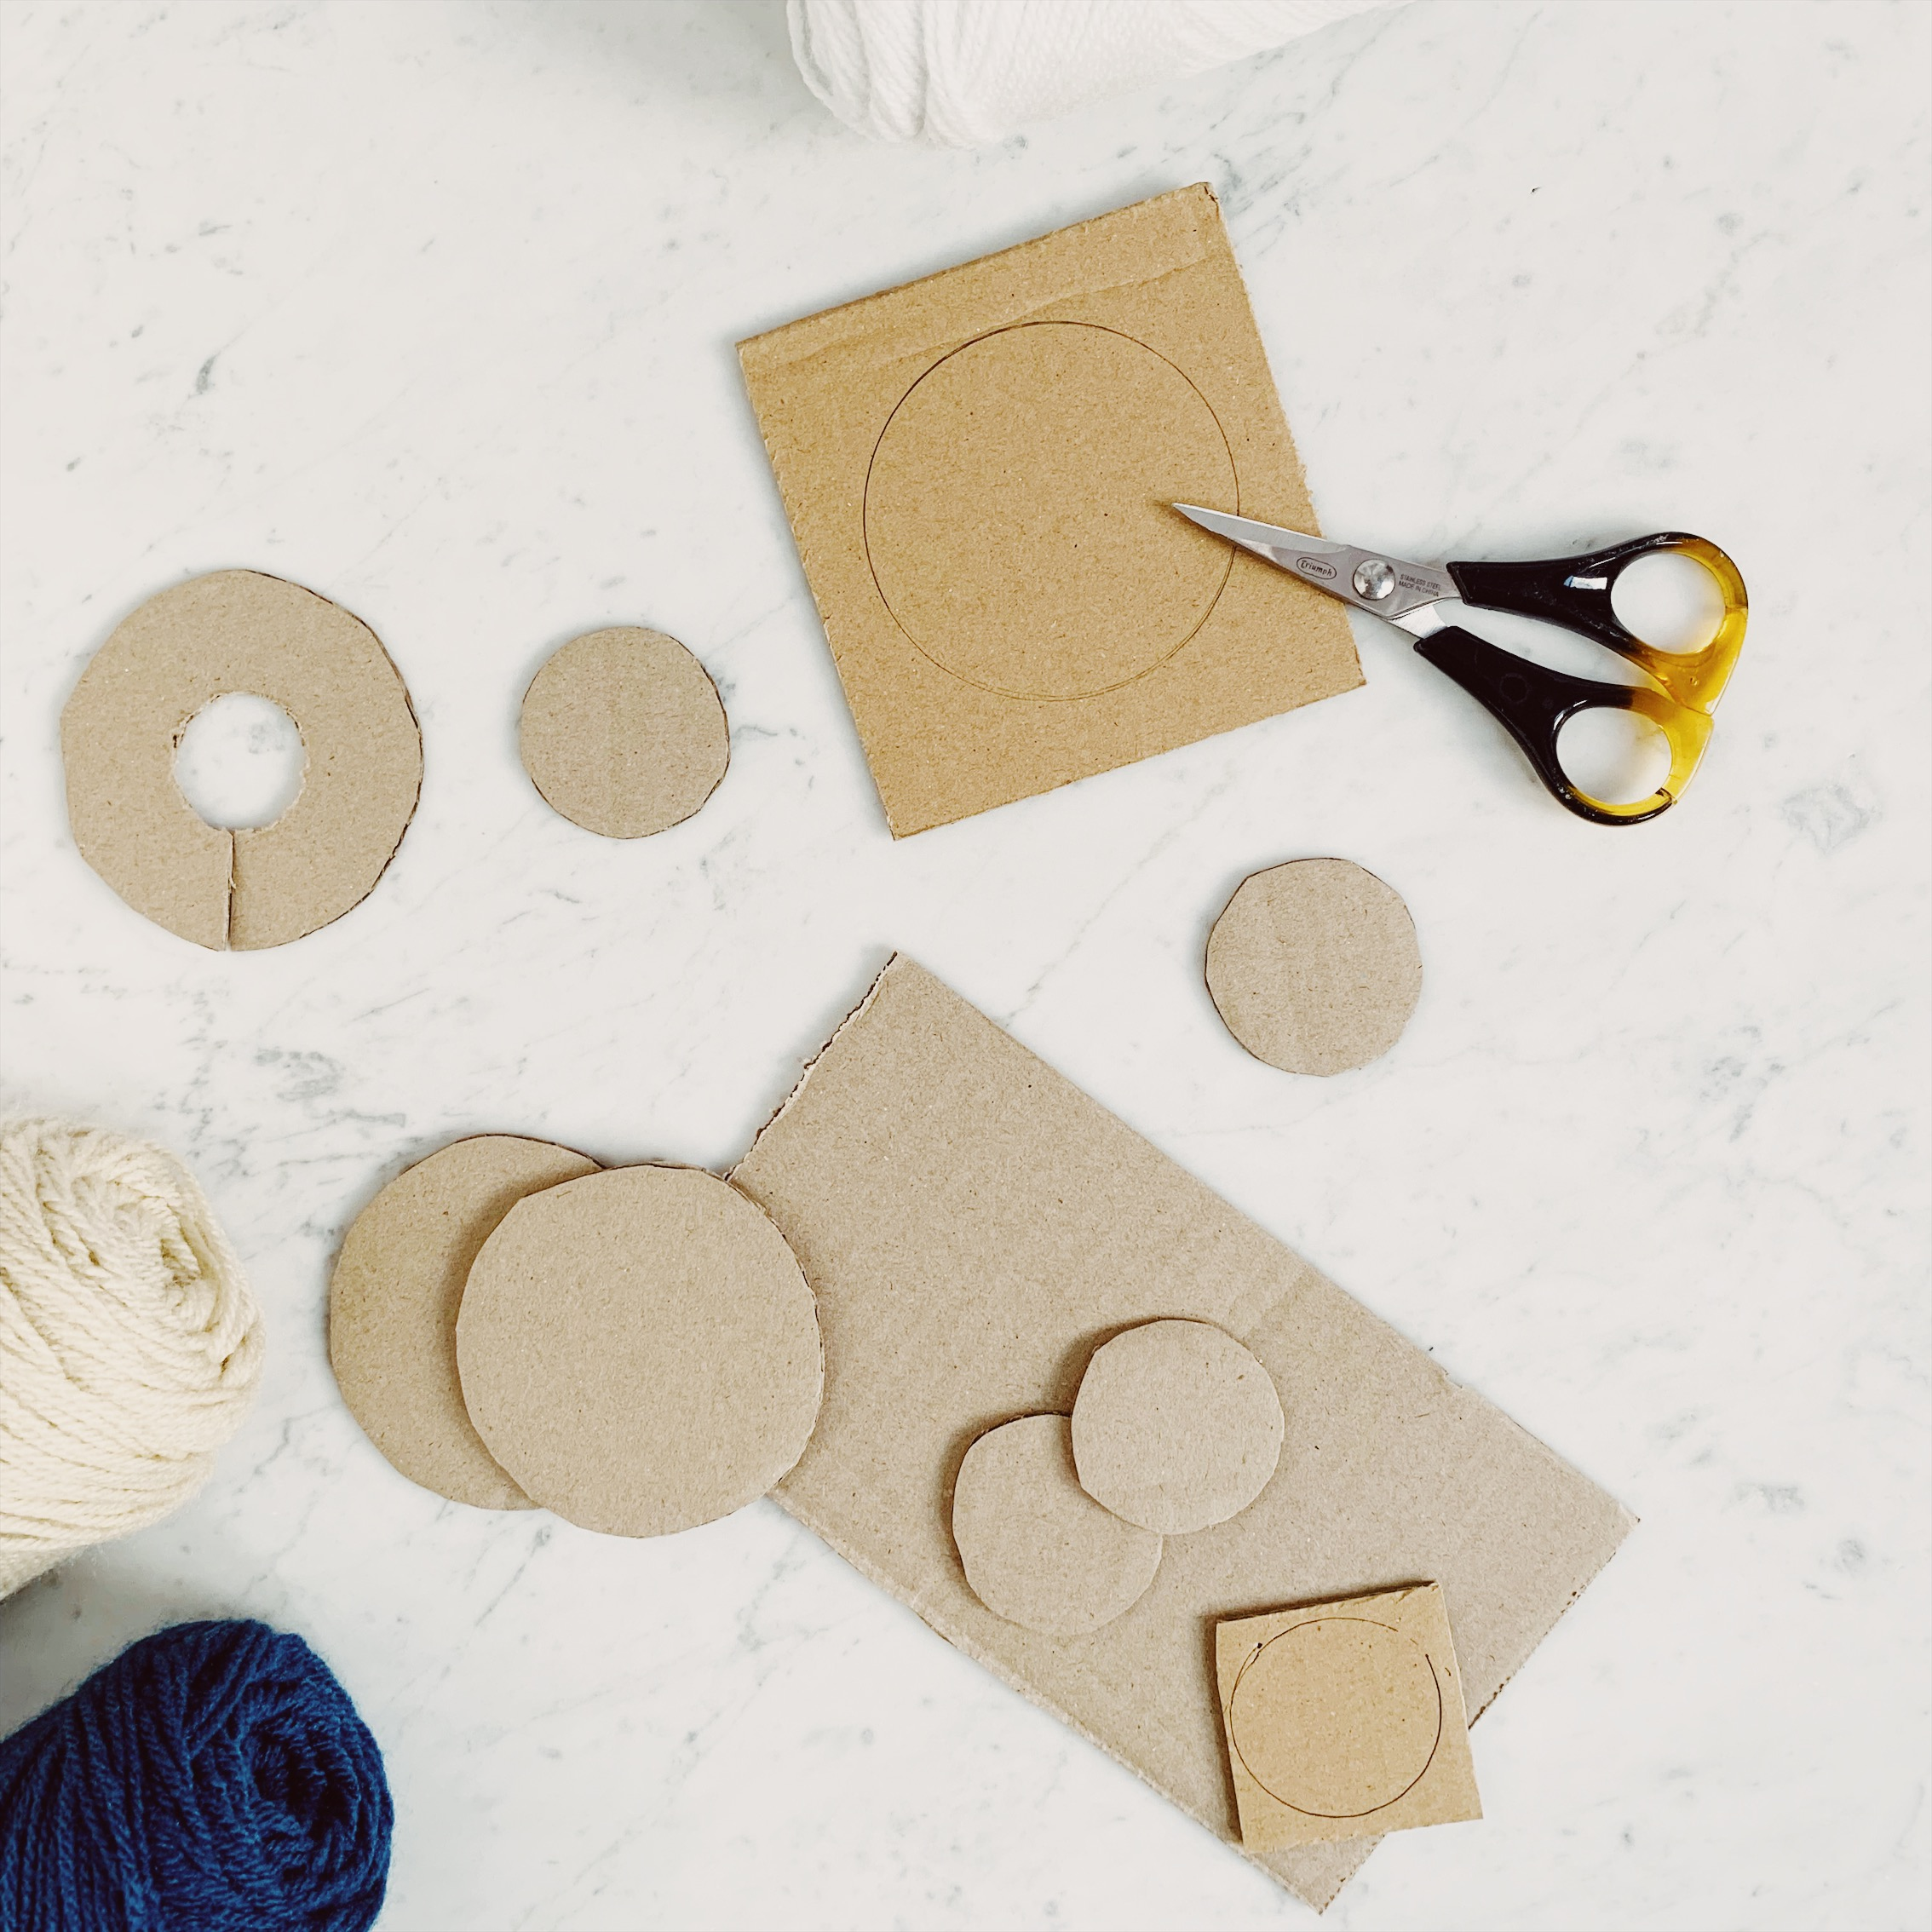 1. Make a cardboard Pom Pom template -